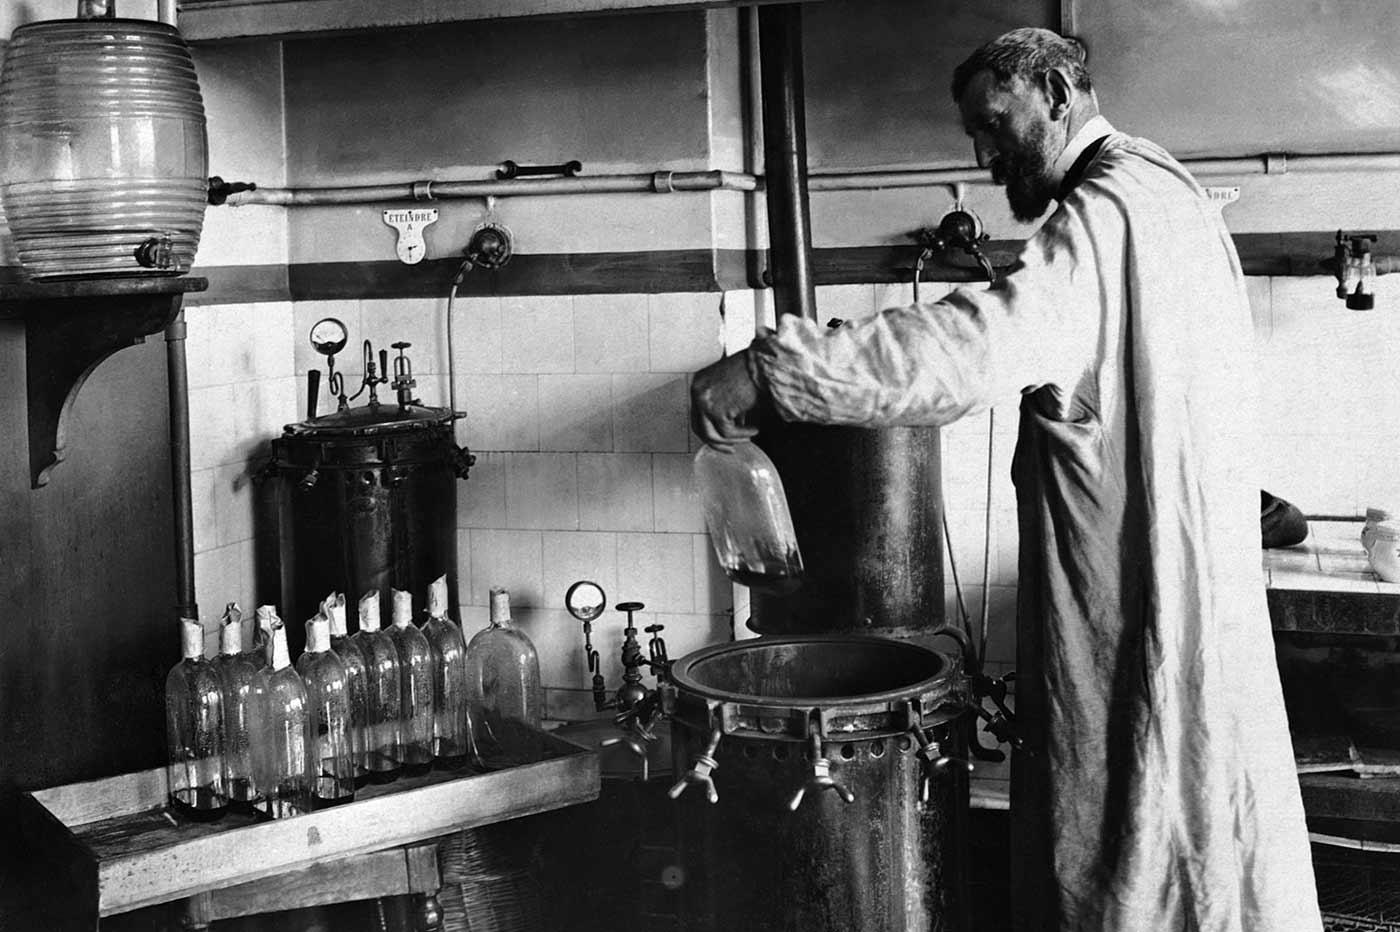 Louis Pasteur performing an experiment.